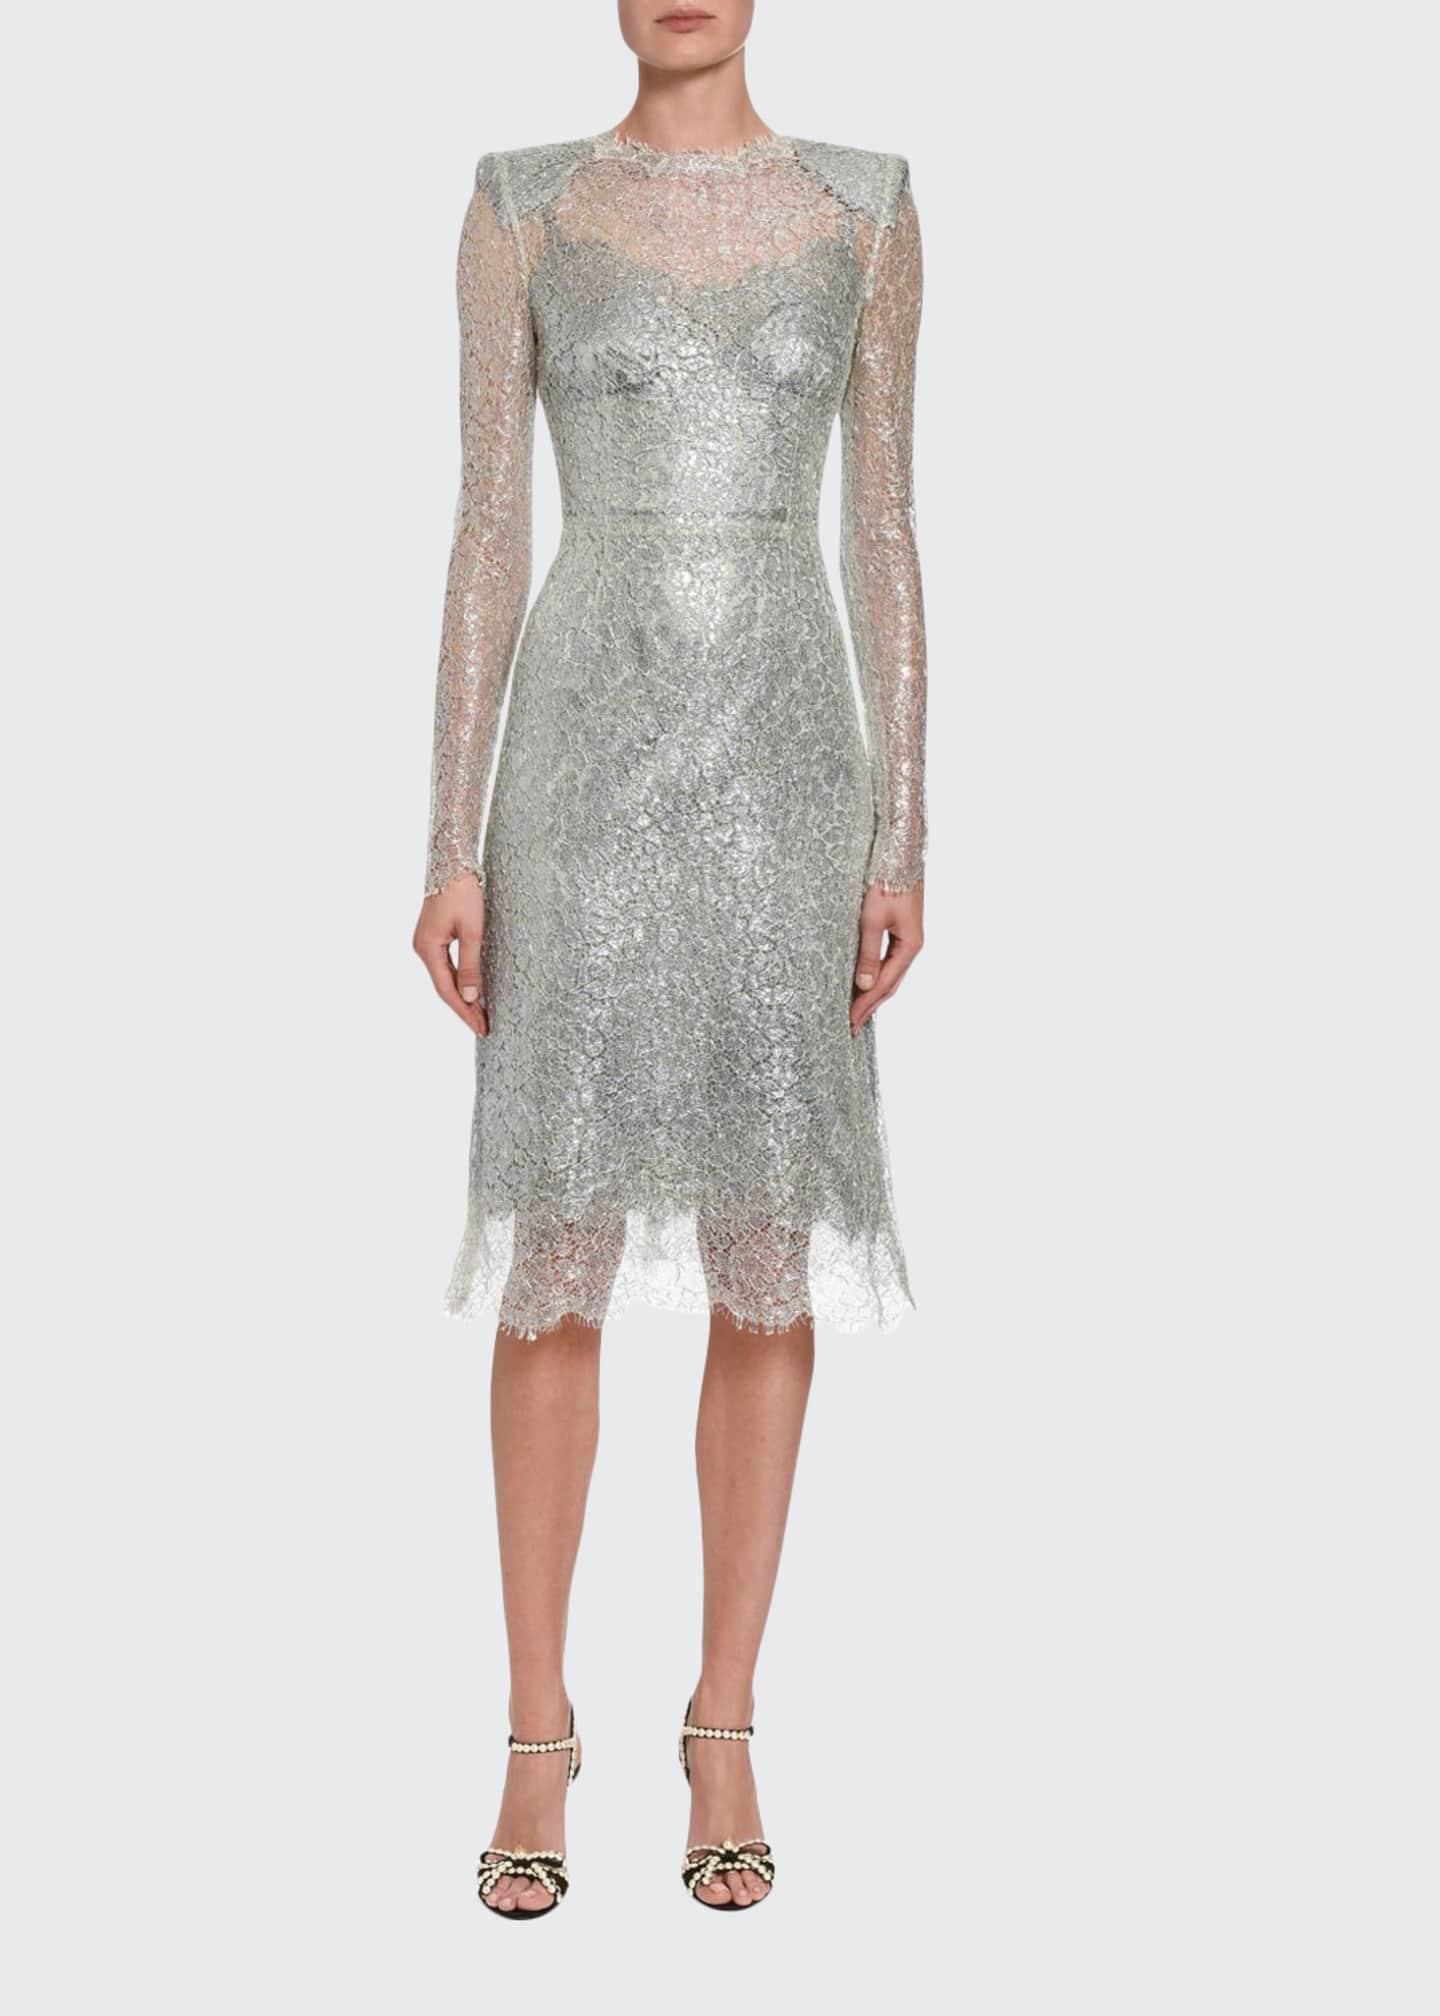 Dolce & Gabbana Long-Sleeve Crewneck Lace Dress